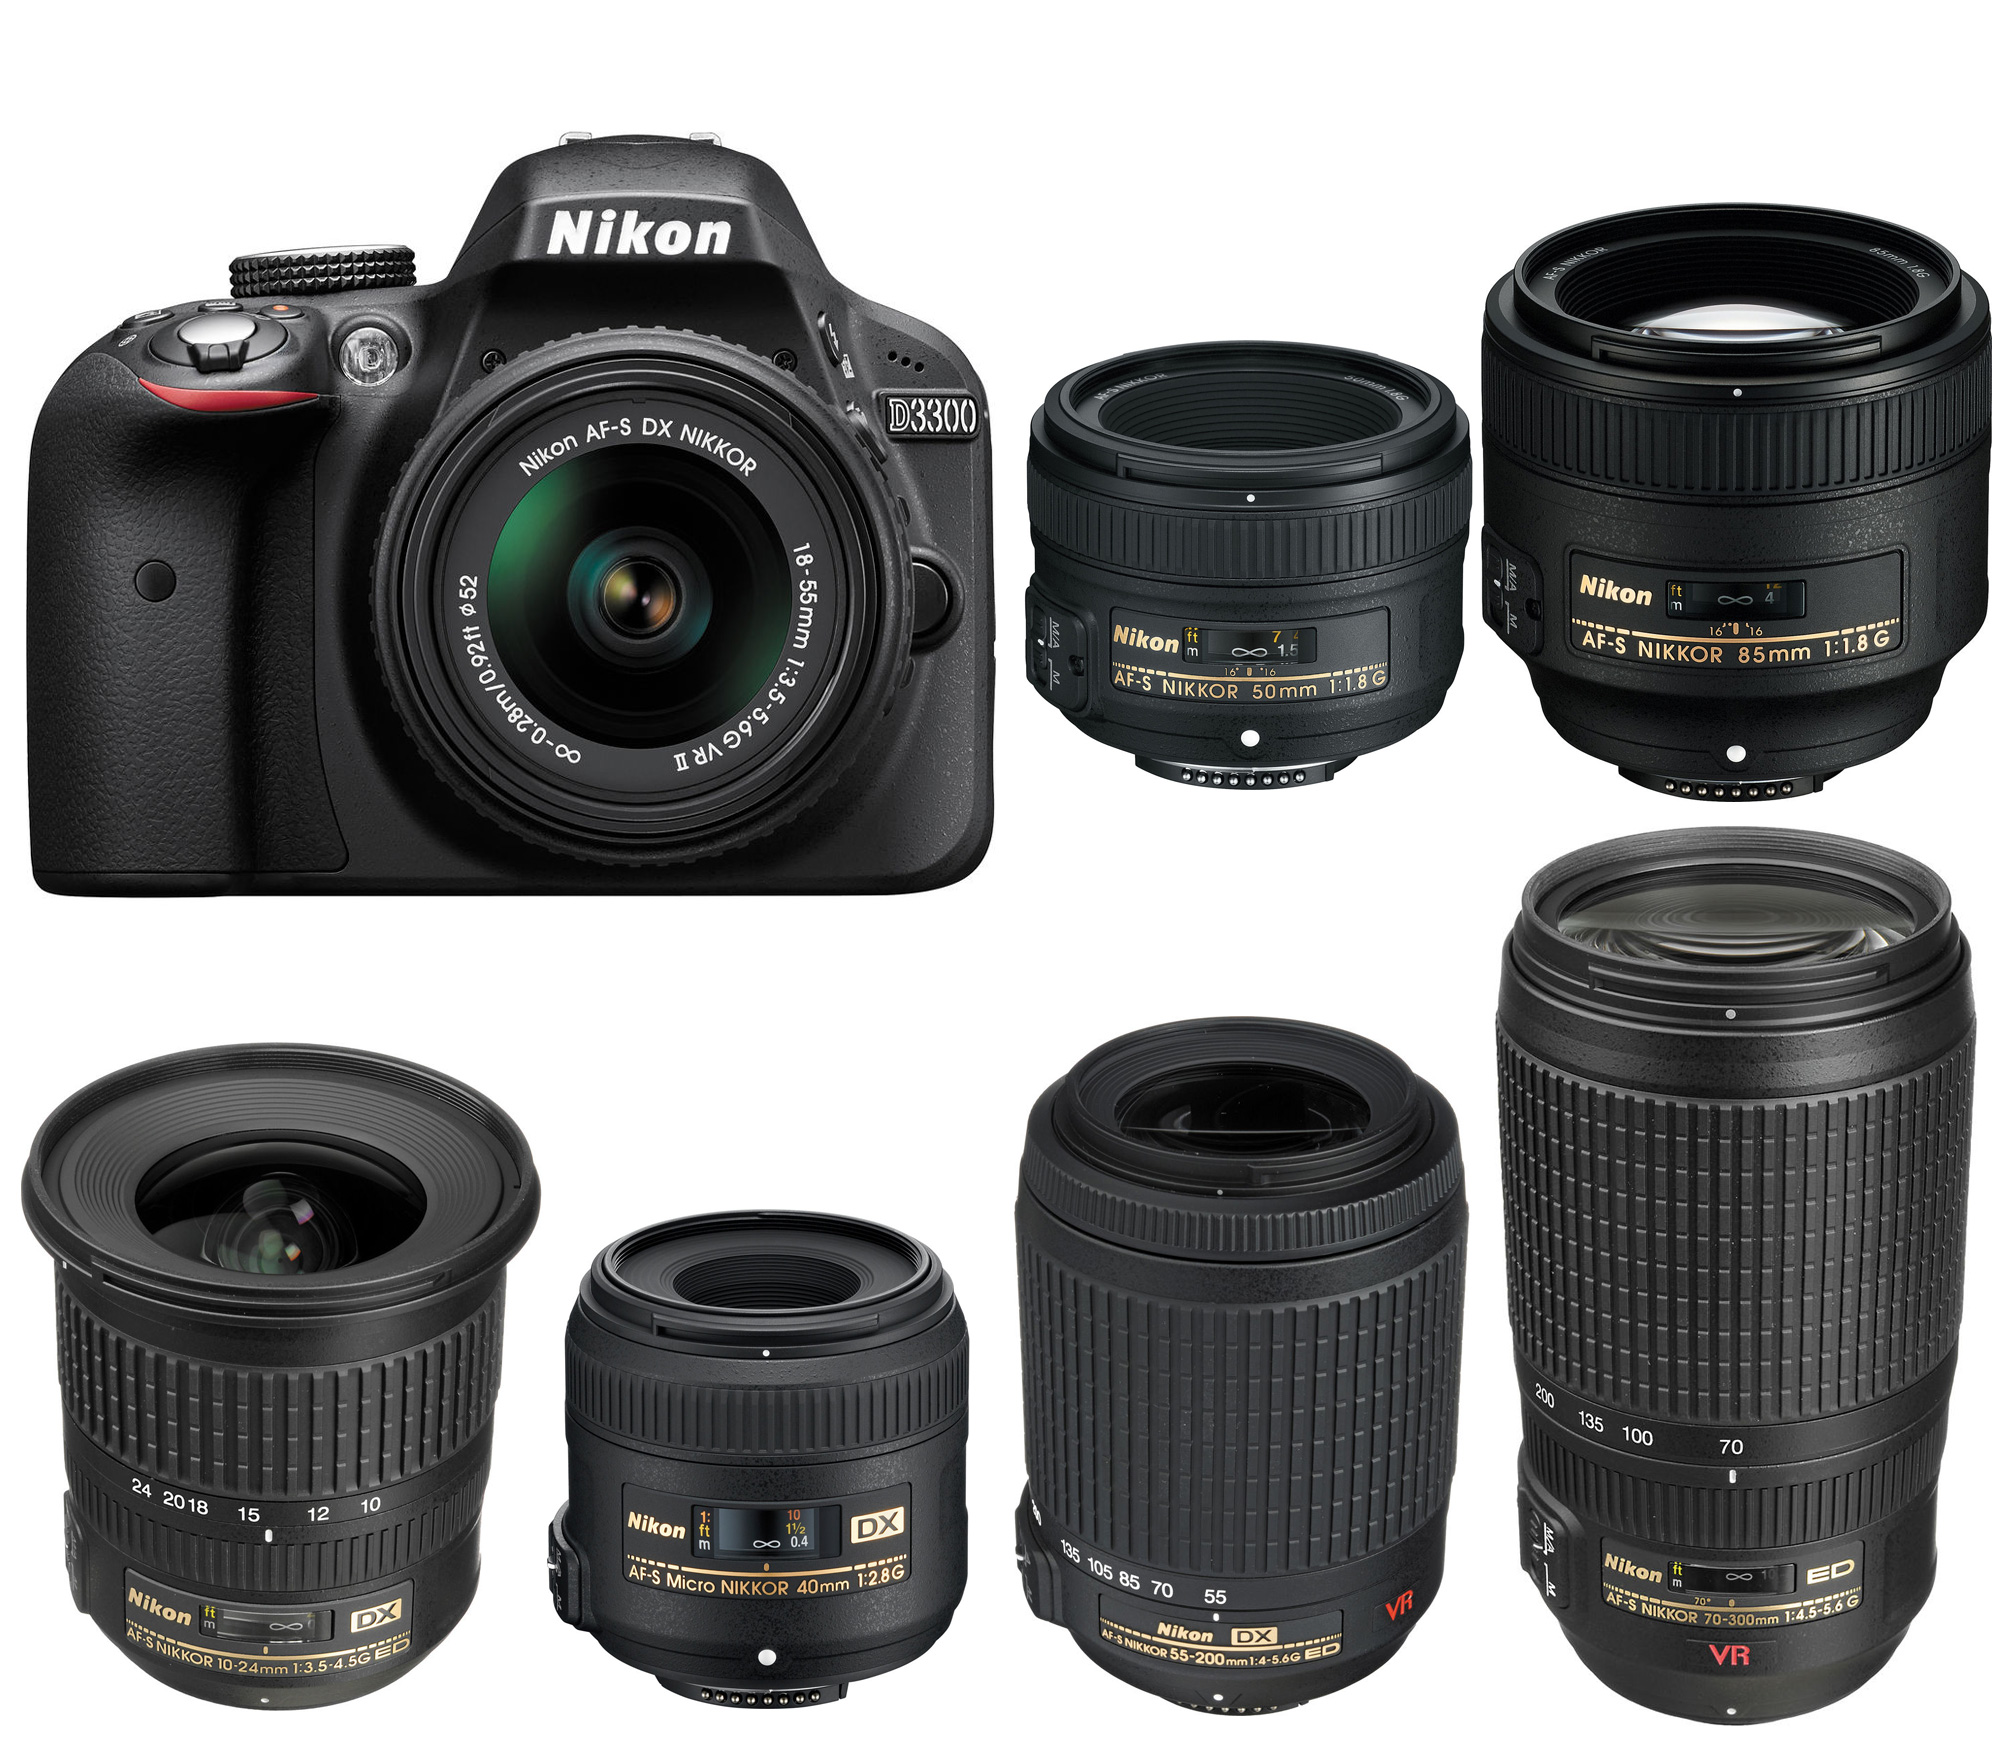 Camera New Nikon Dslr Cameras 2014 nikon d3300 camera news at cameraegg best lenses for d3300